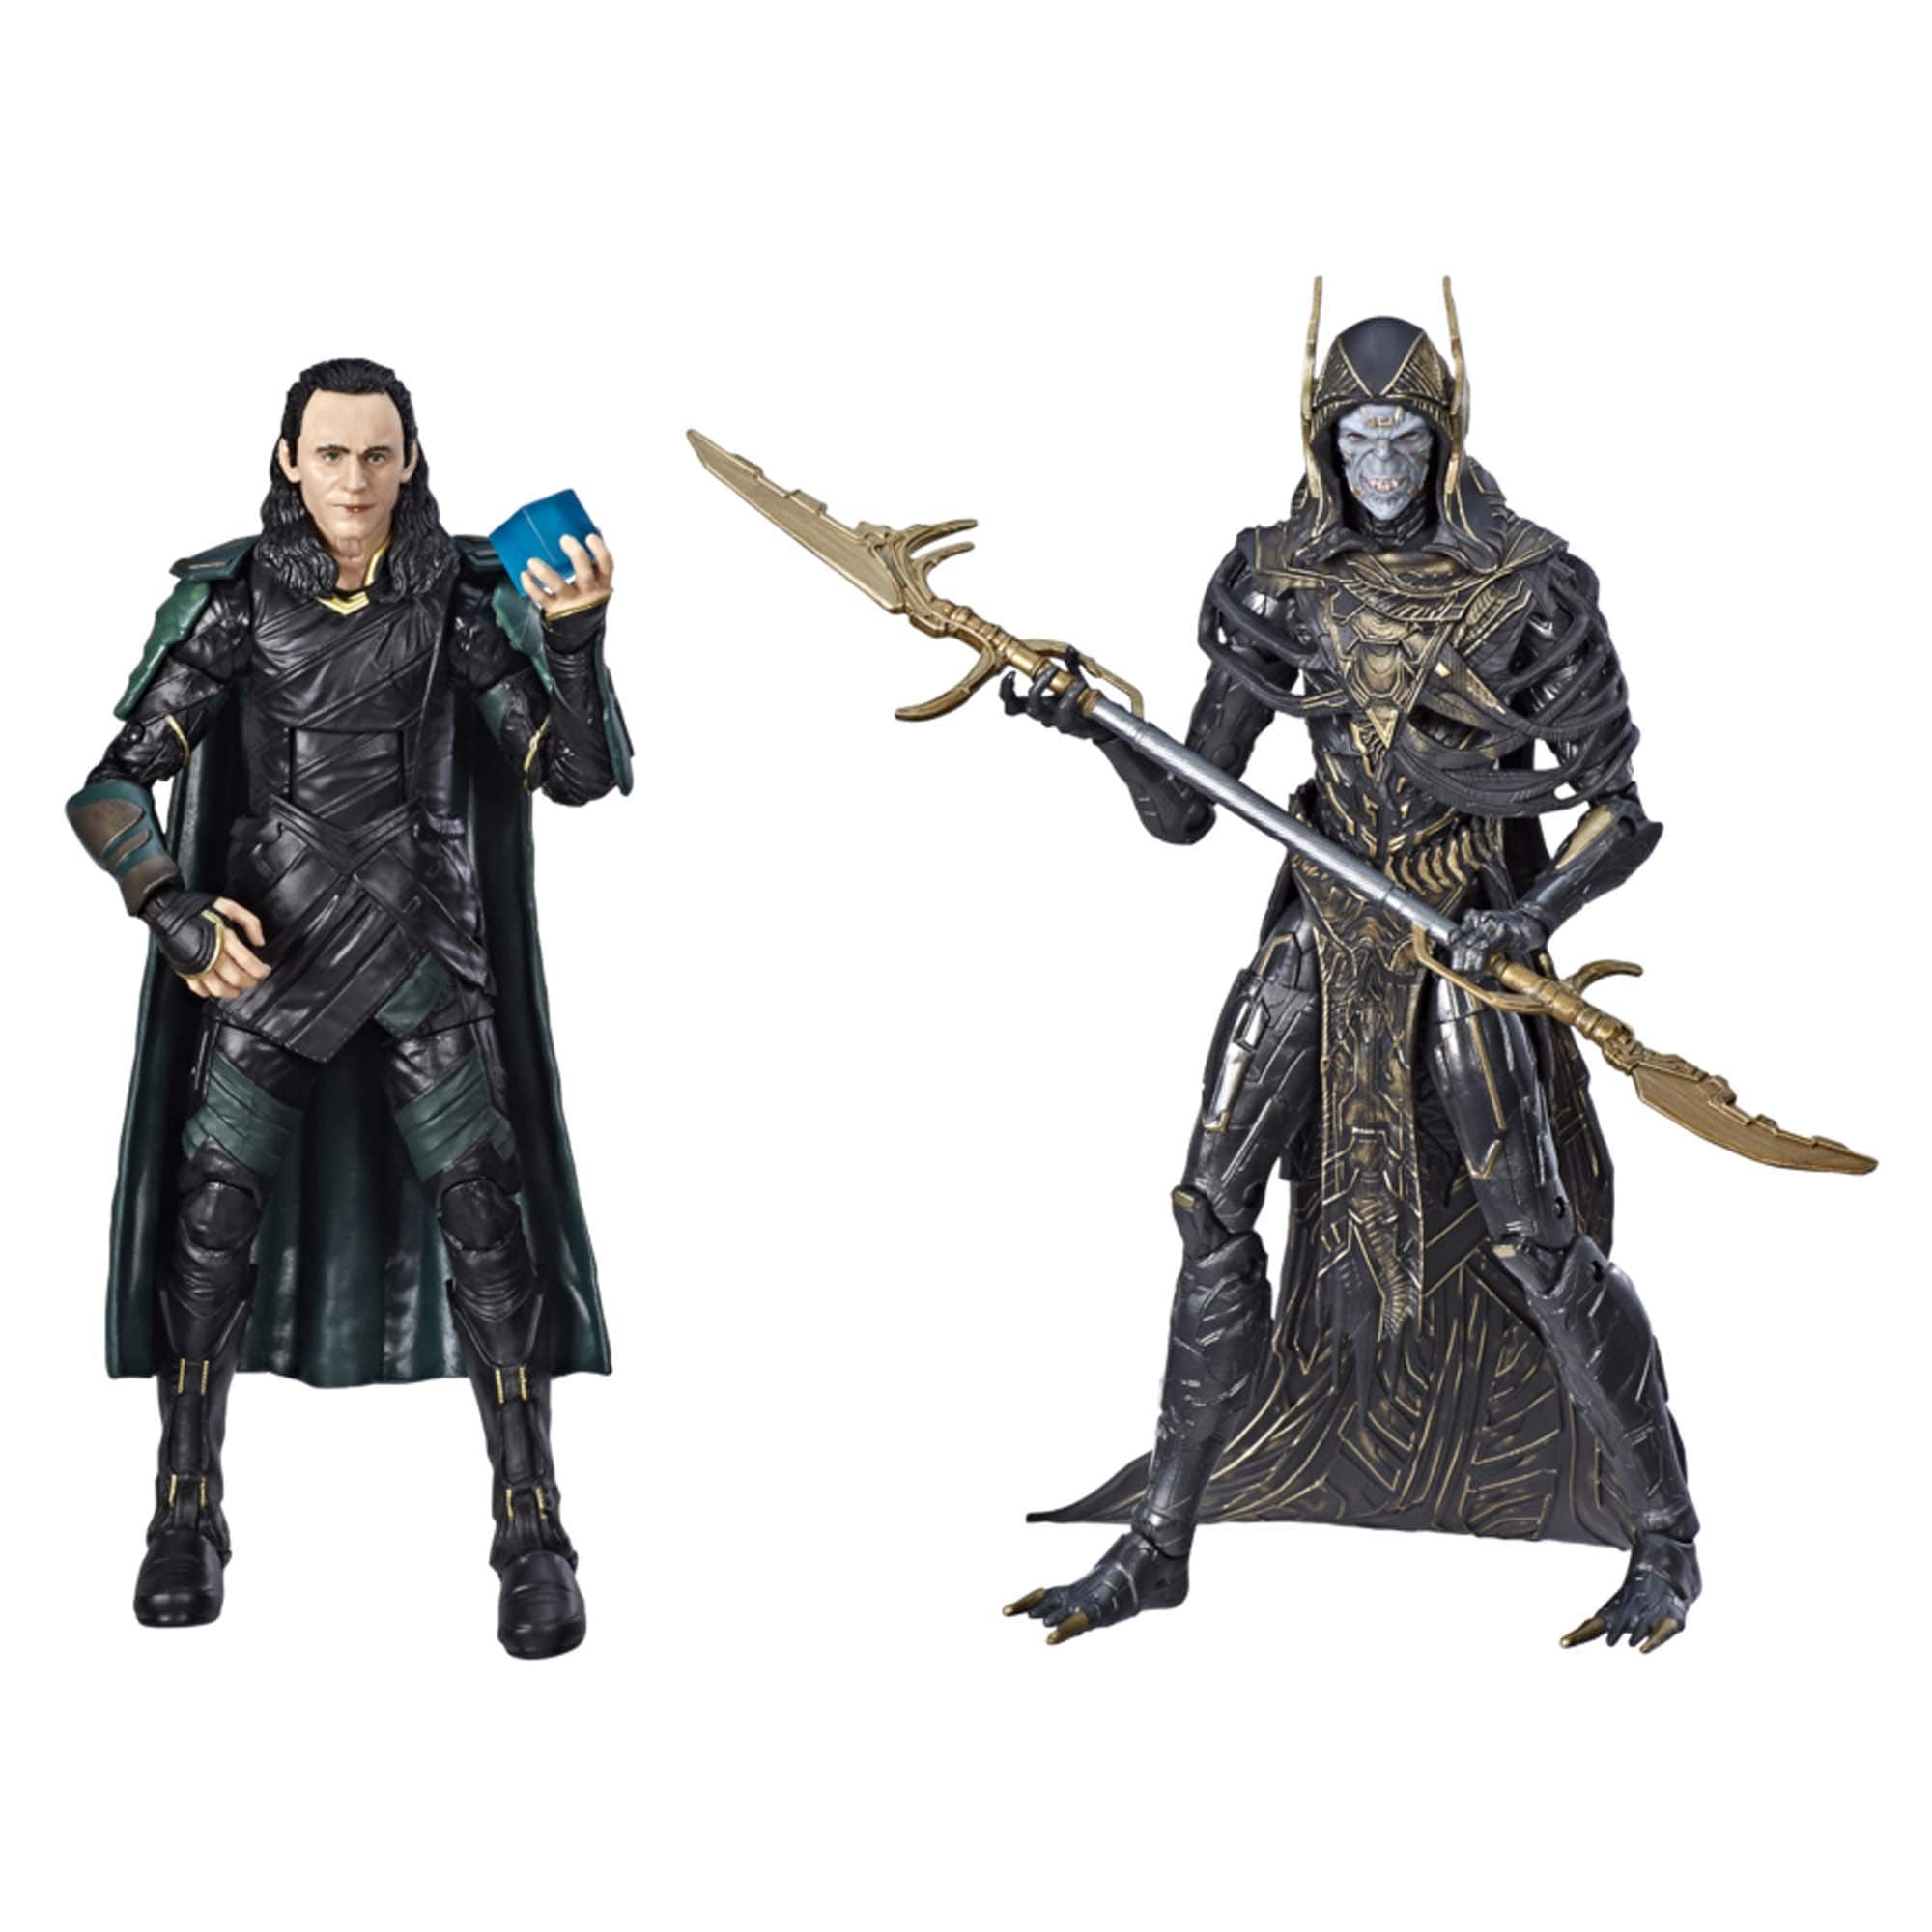 Marvel Legends Series Avengers: Infinity War Loki & Corvus Glaive $29.97 - Walmart